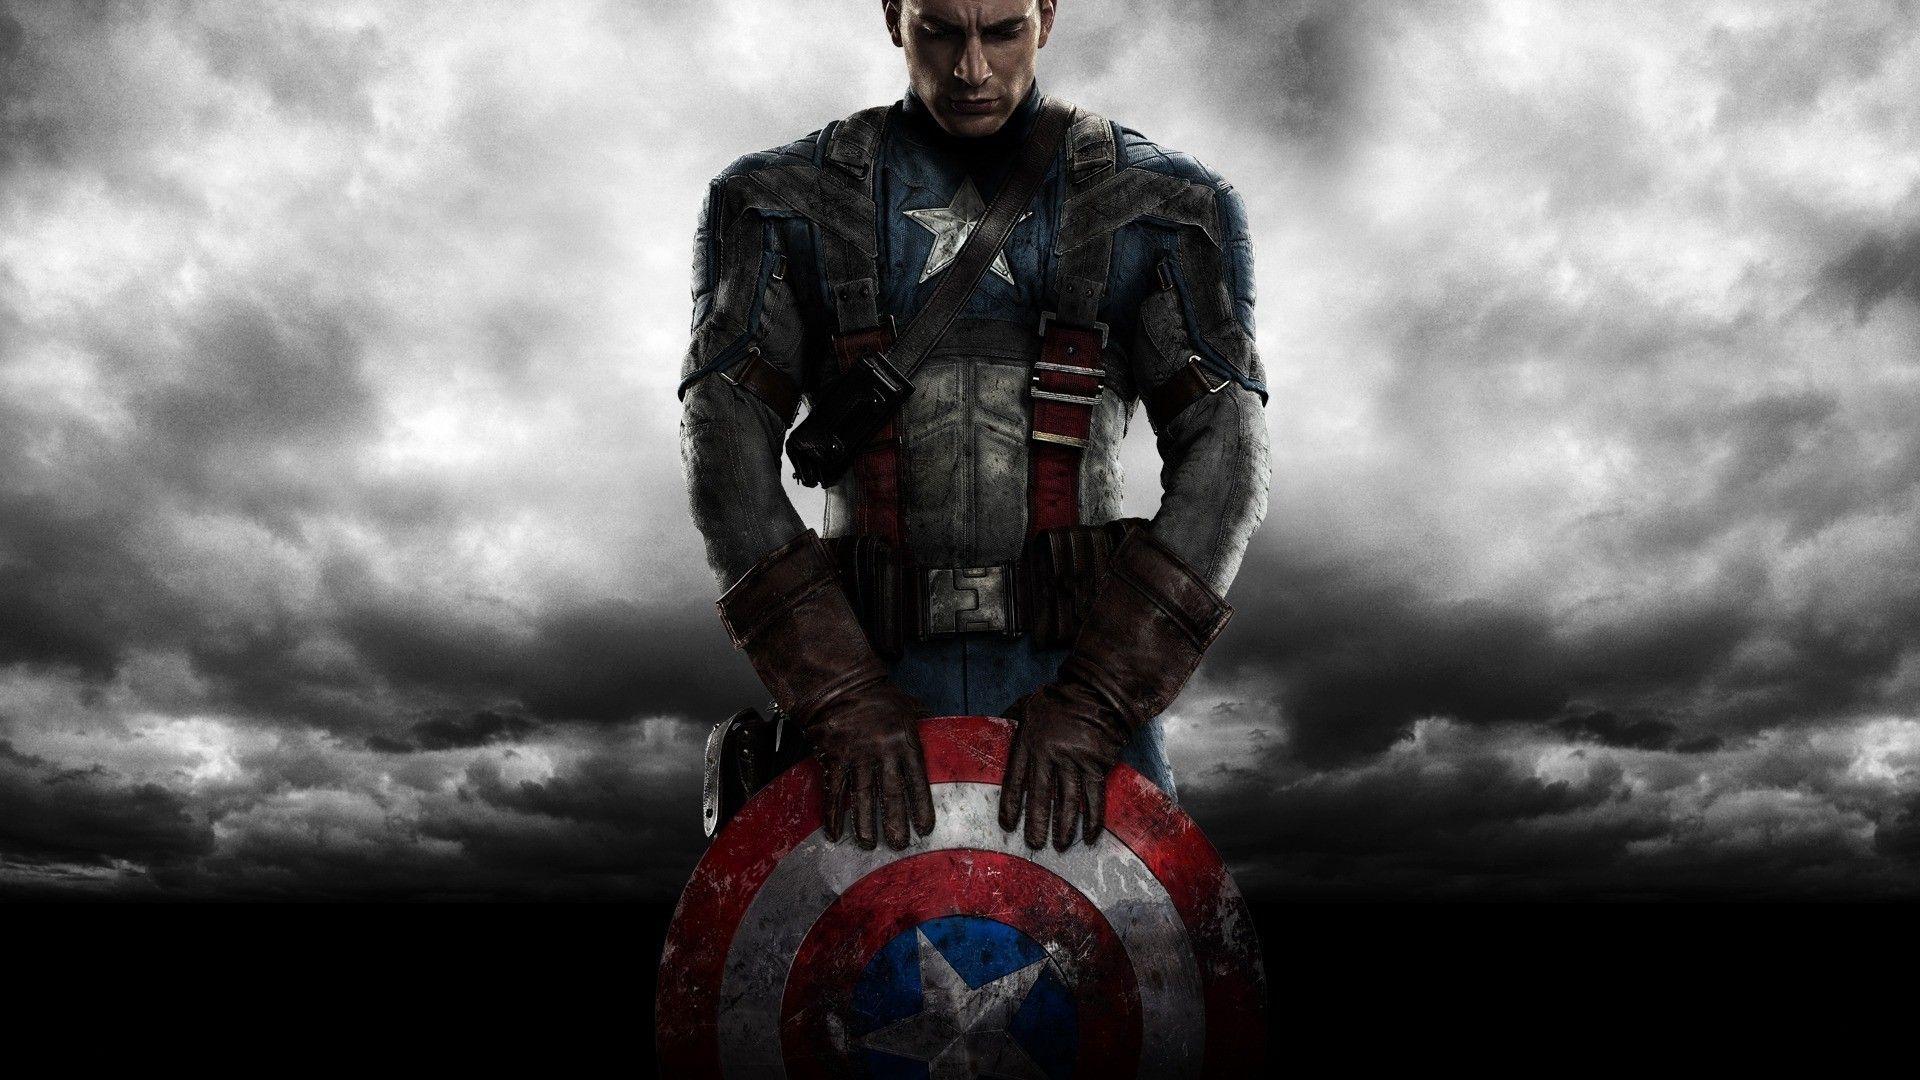 Captain America Costumes Fondo De Pantalla Del Capitan America Capitan America Primer Vengador Capitan America Civil War